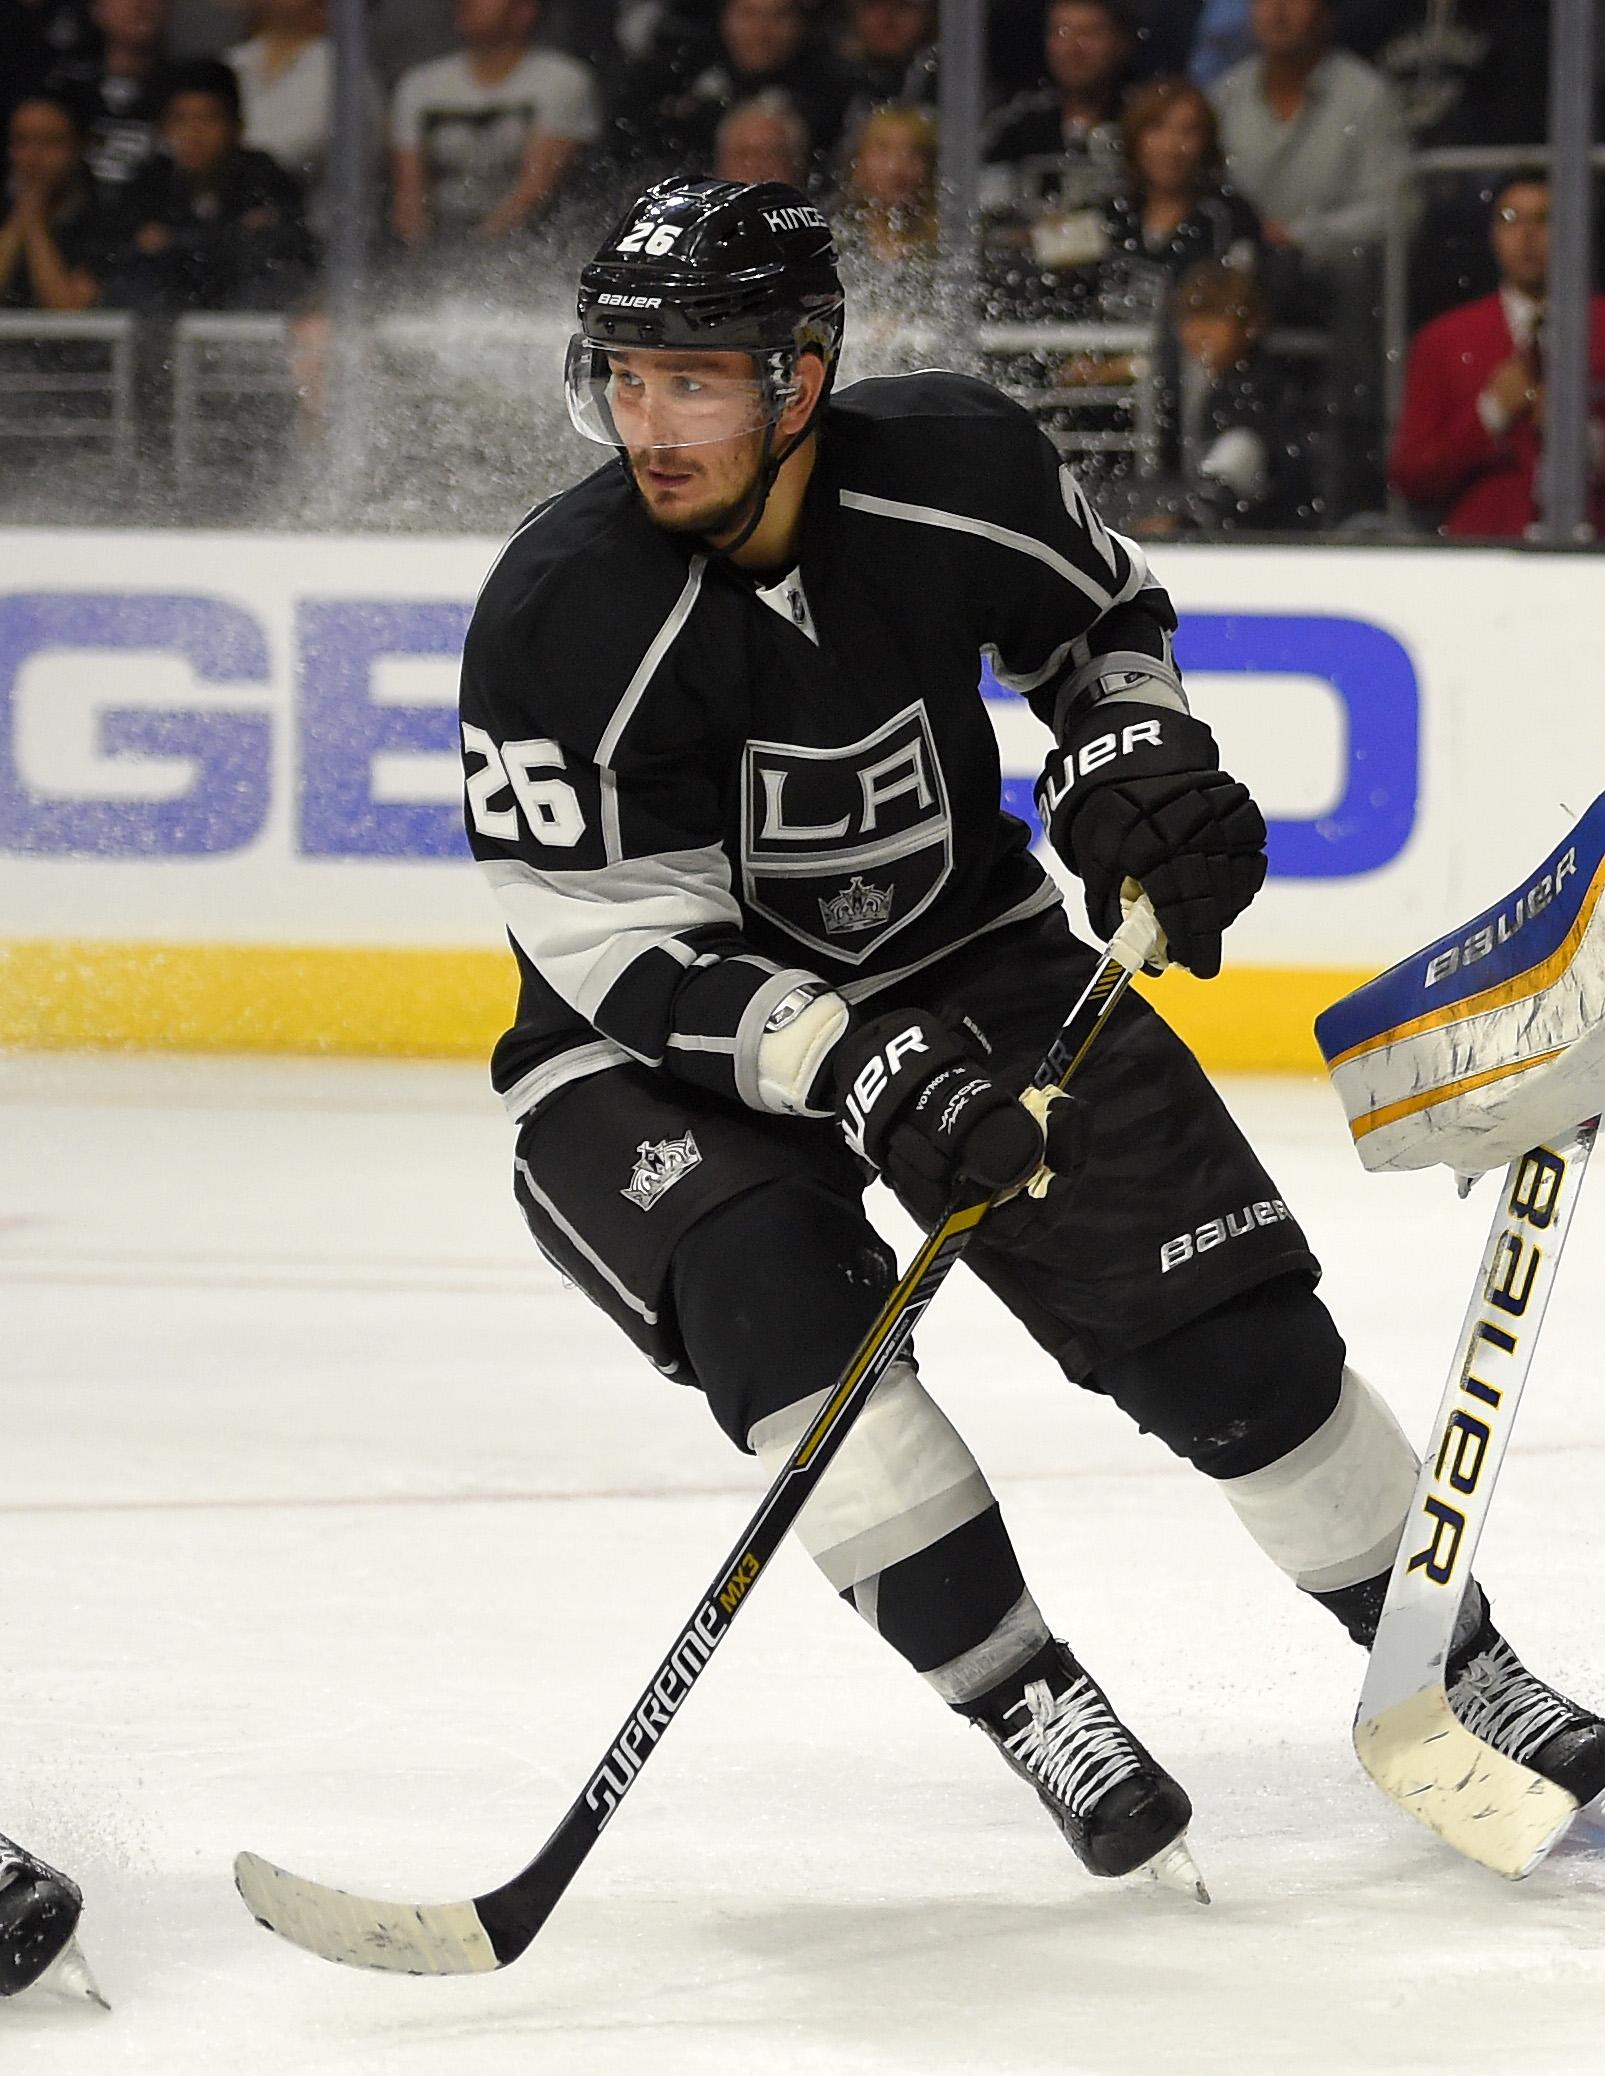 LA Kings: Suspended Voynov tore Achilles tendon, had surgery